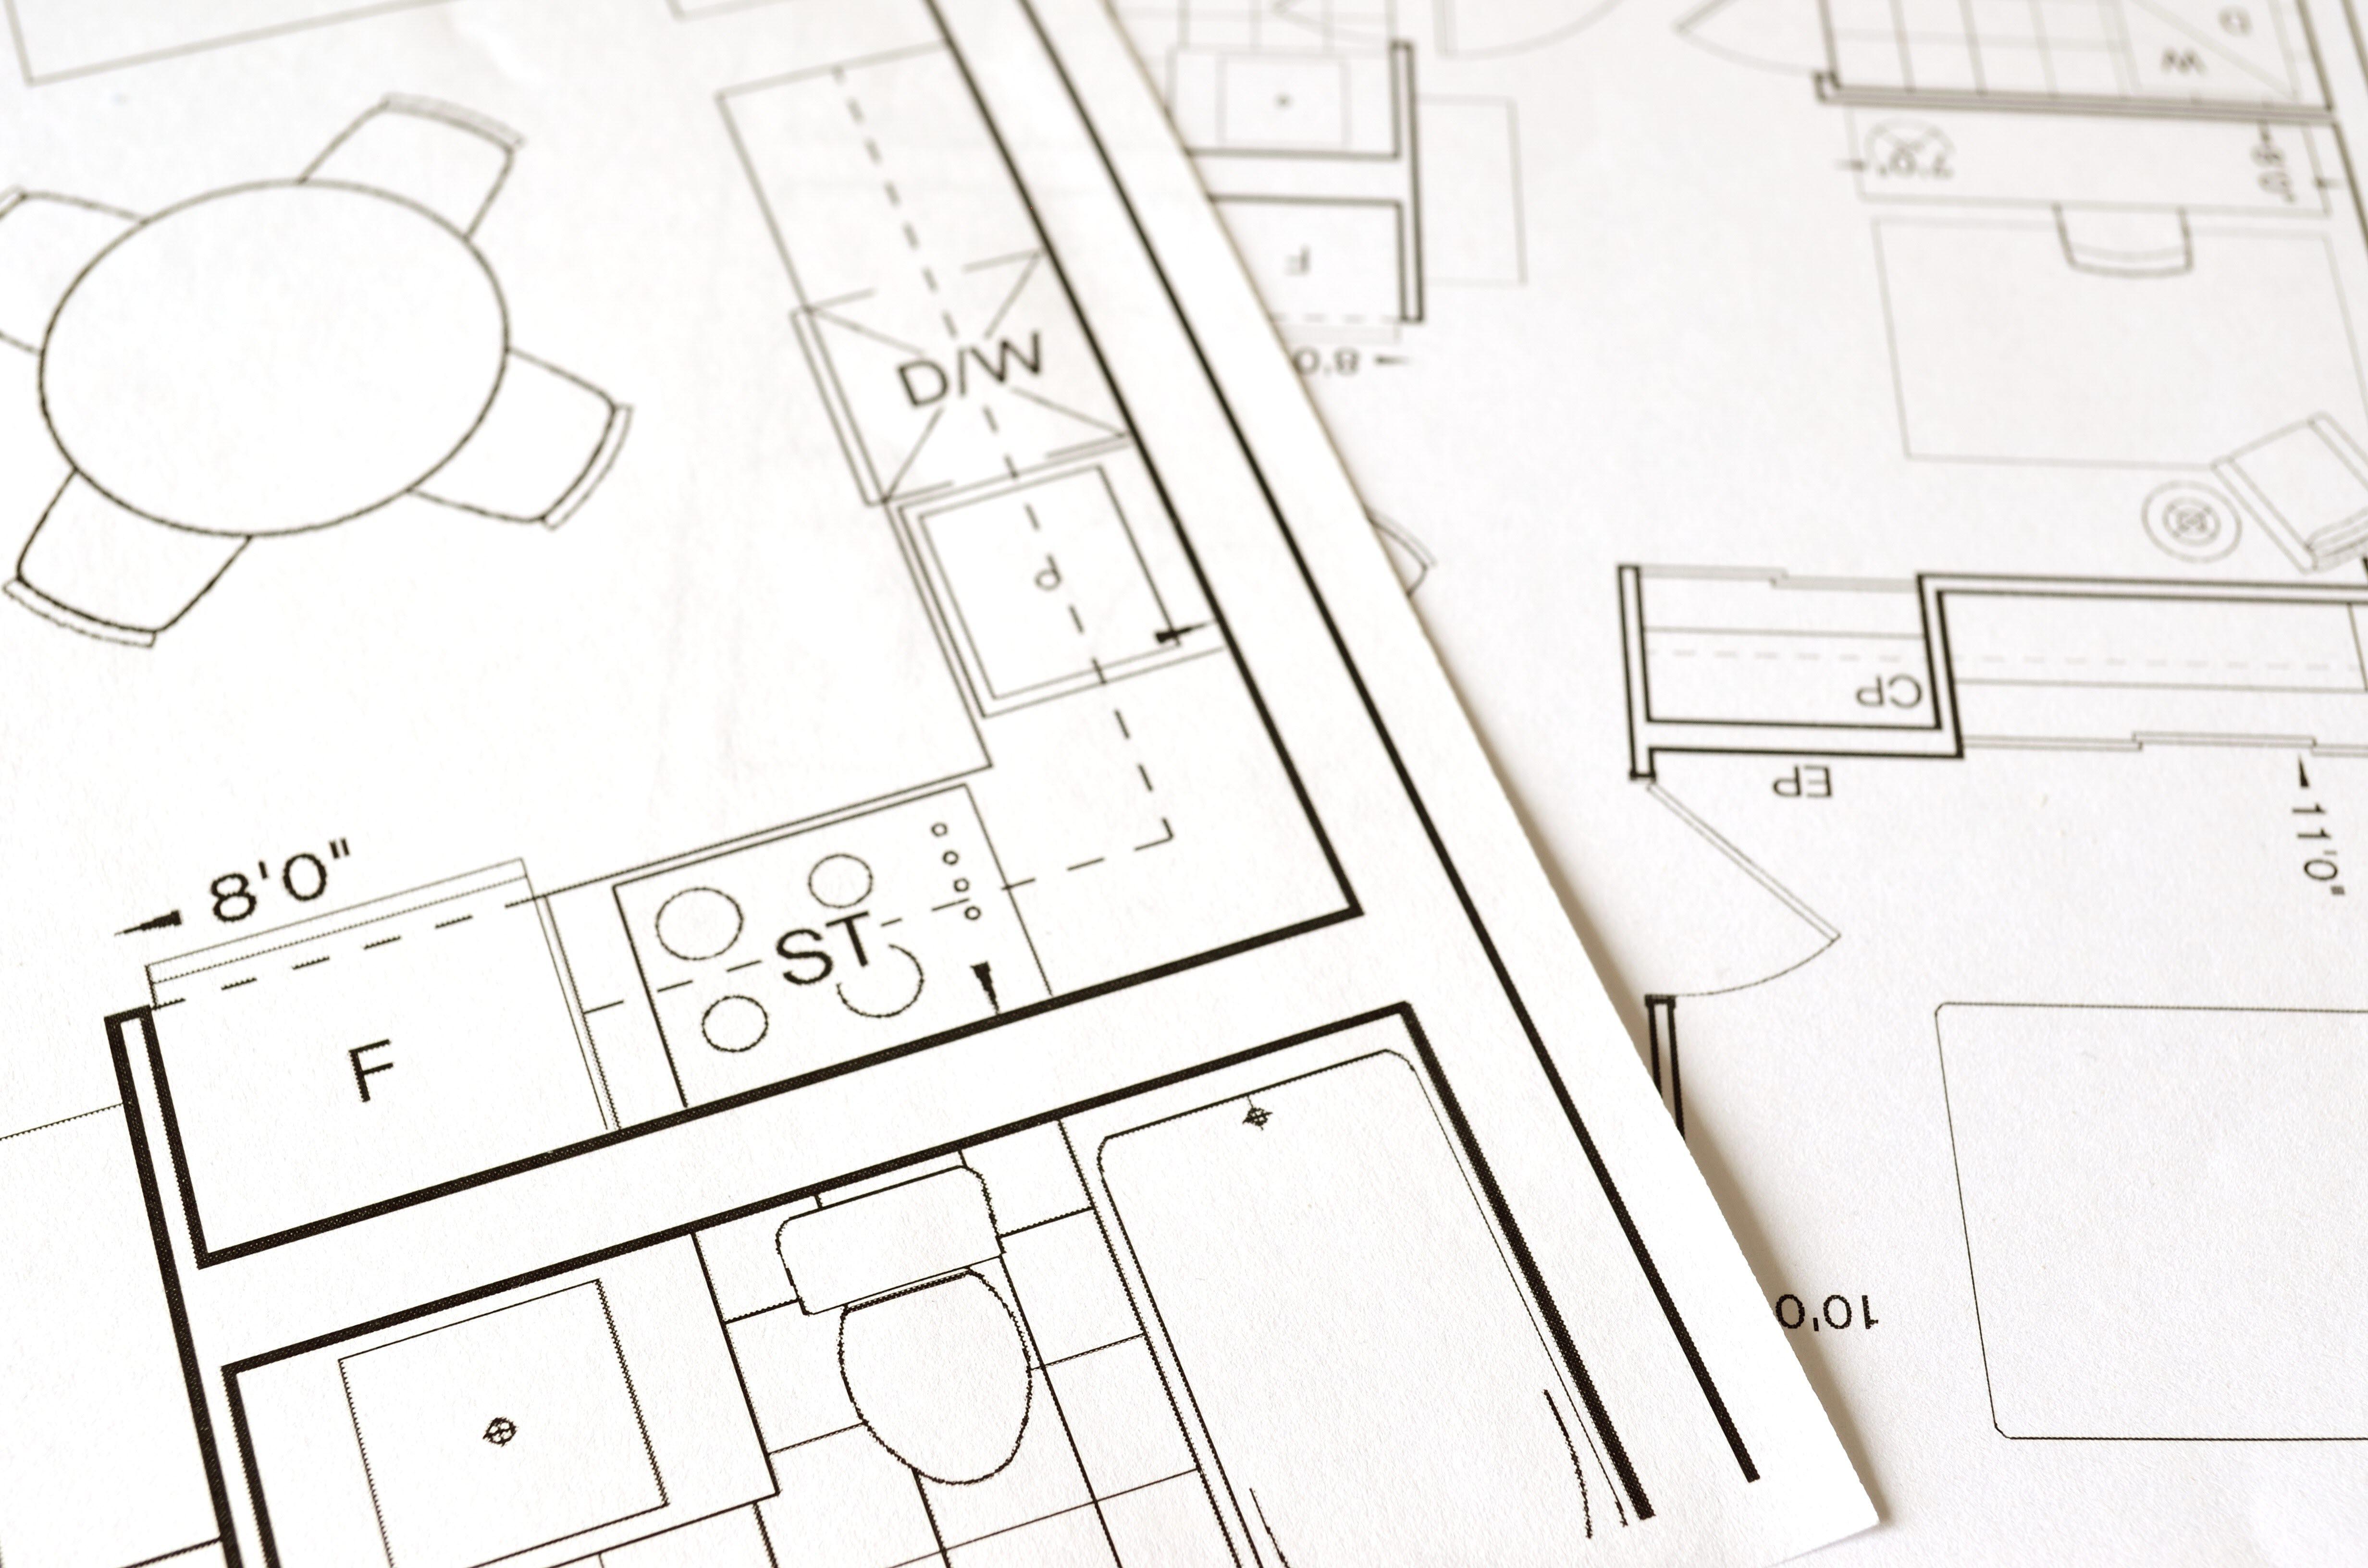 Financial management practices of general contractors malvernweather Images